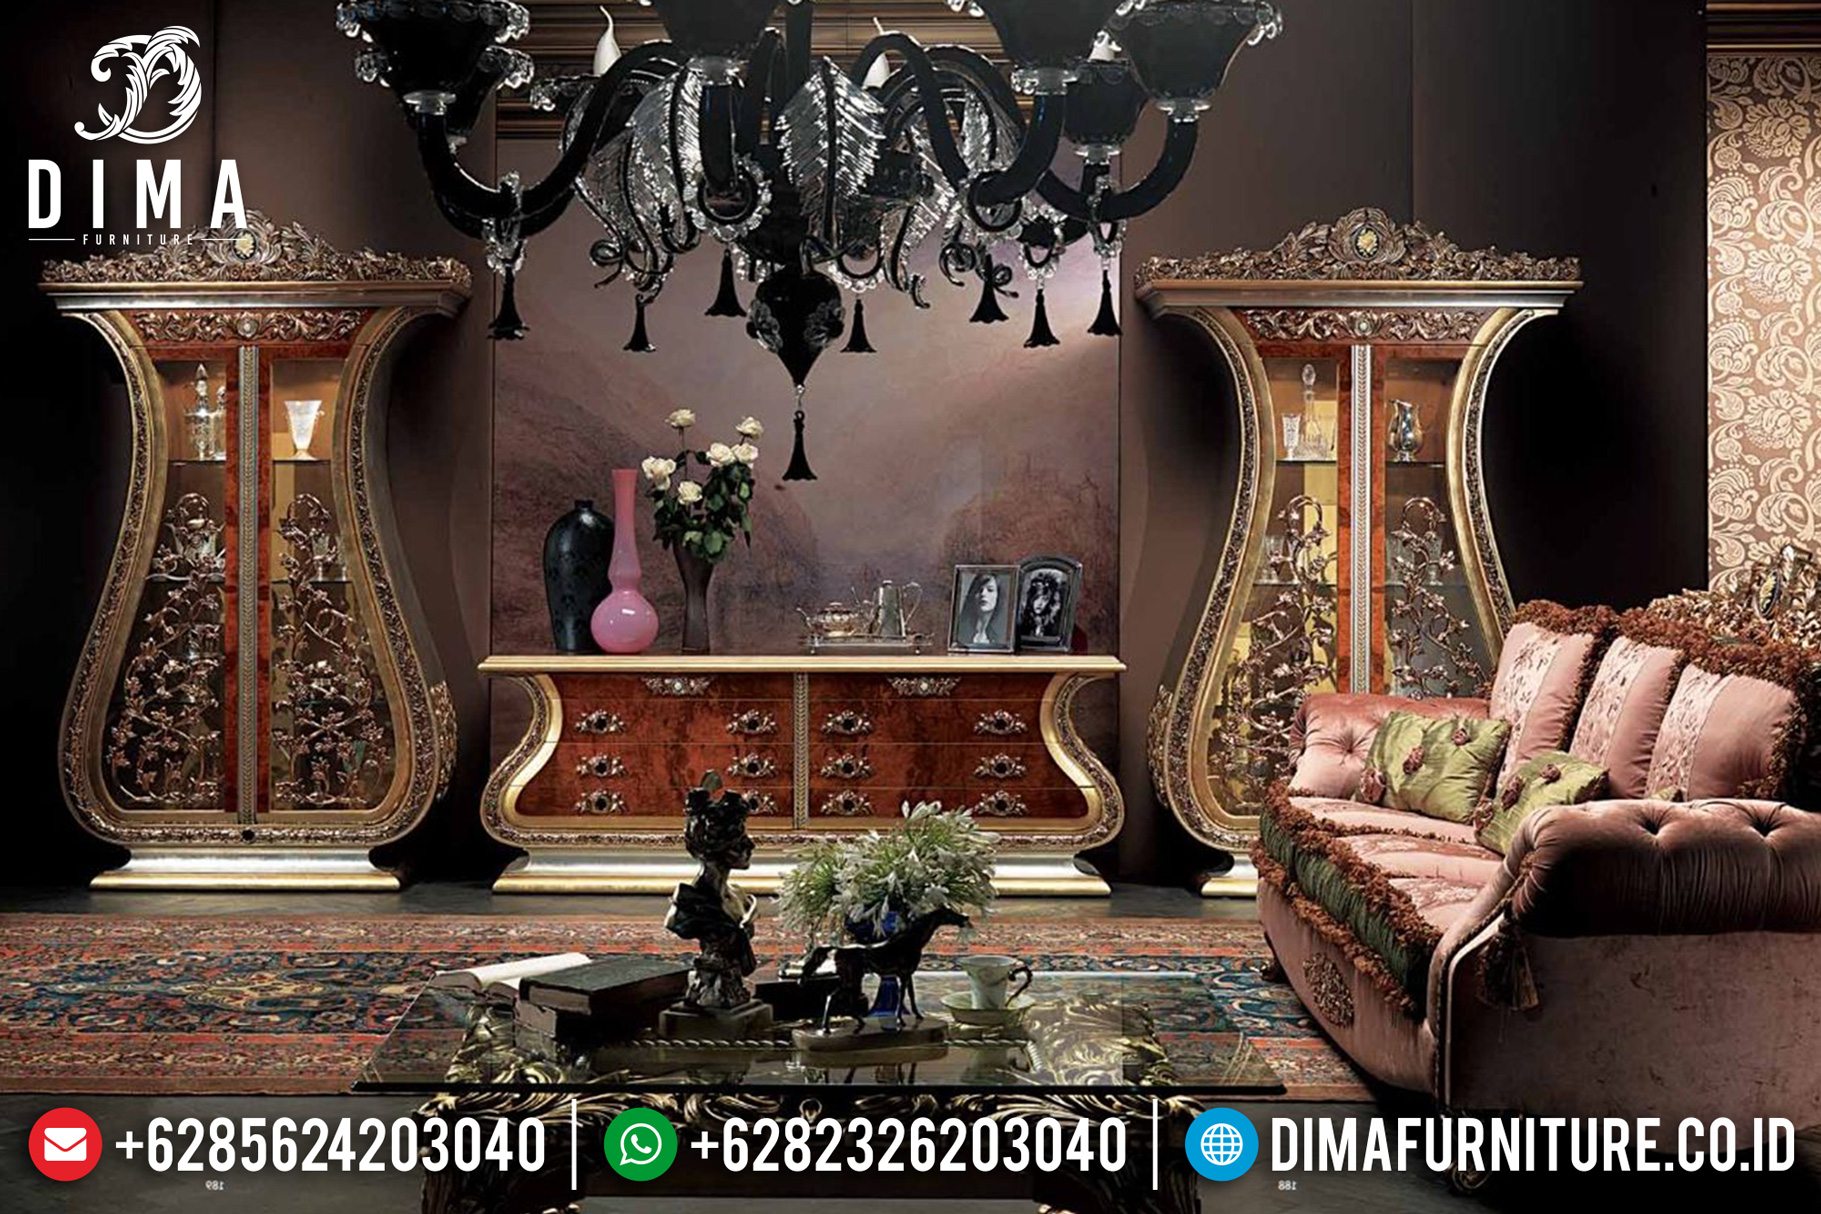 Lemari Hias Bufet TV Jepara Mewah 2019-2020 BT-0065